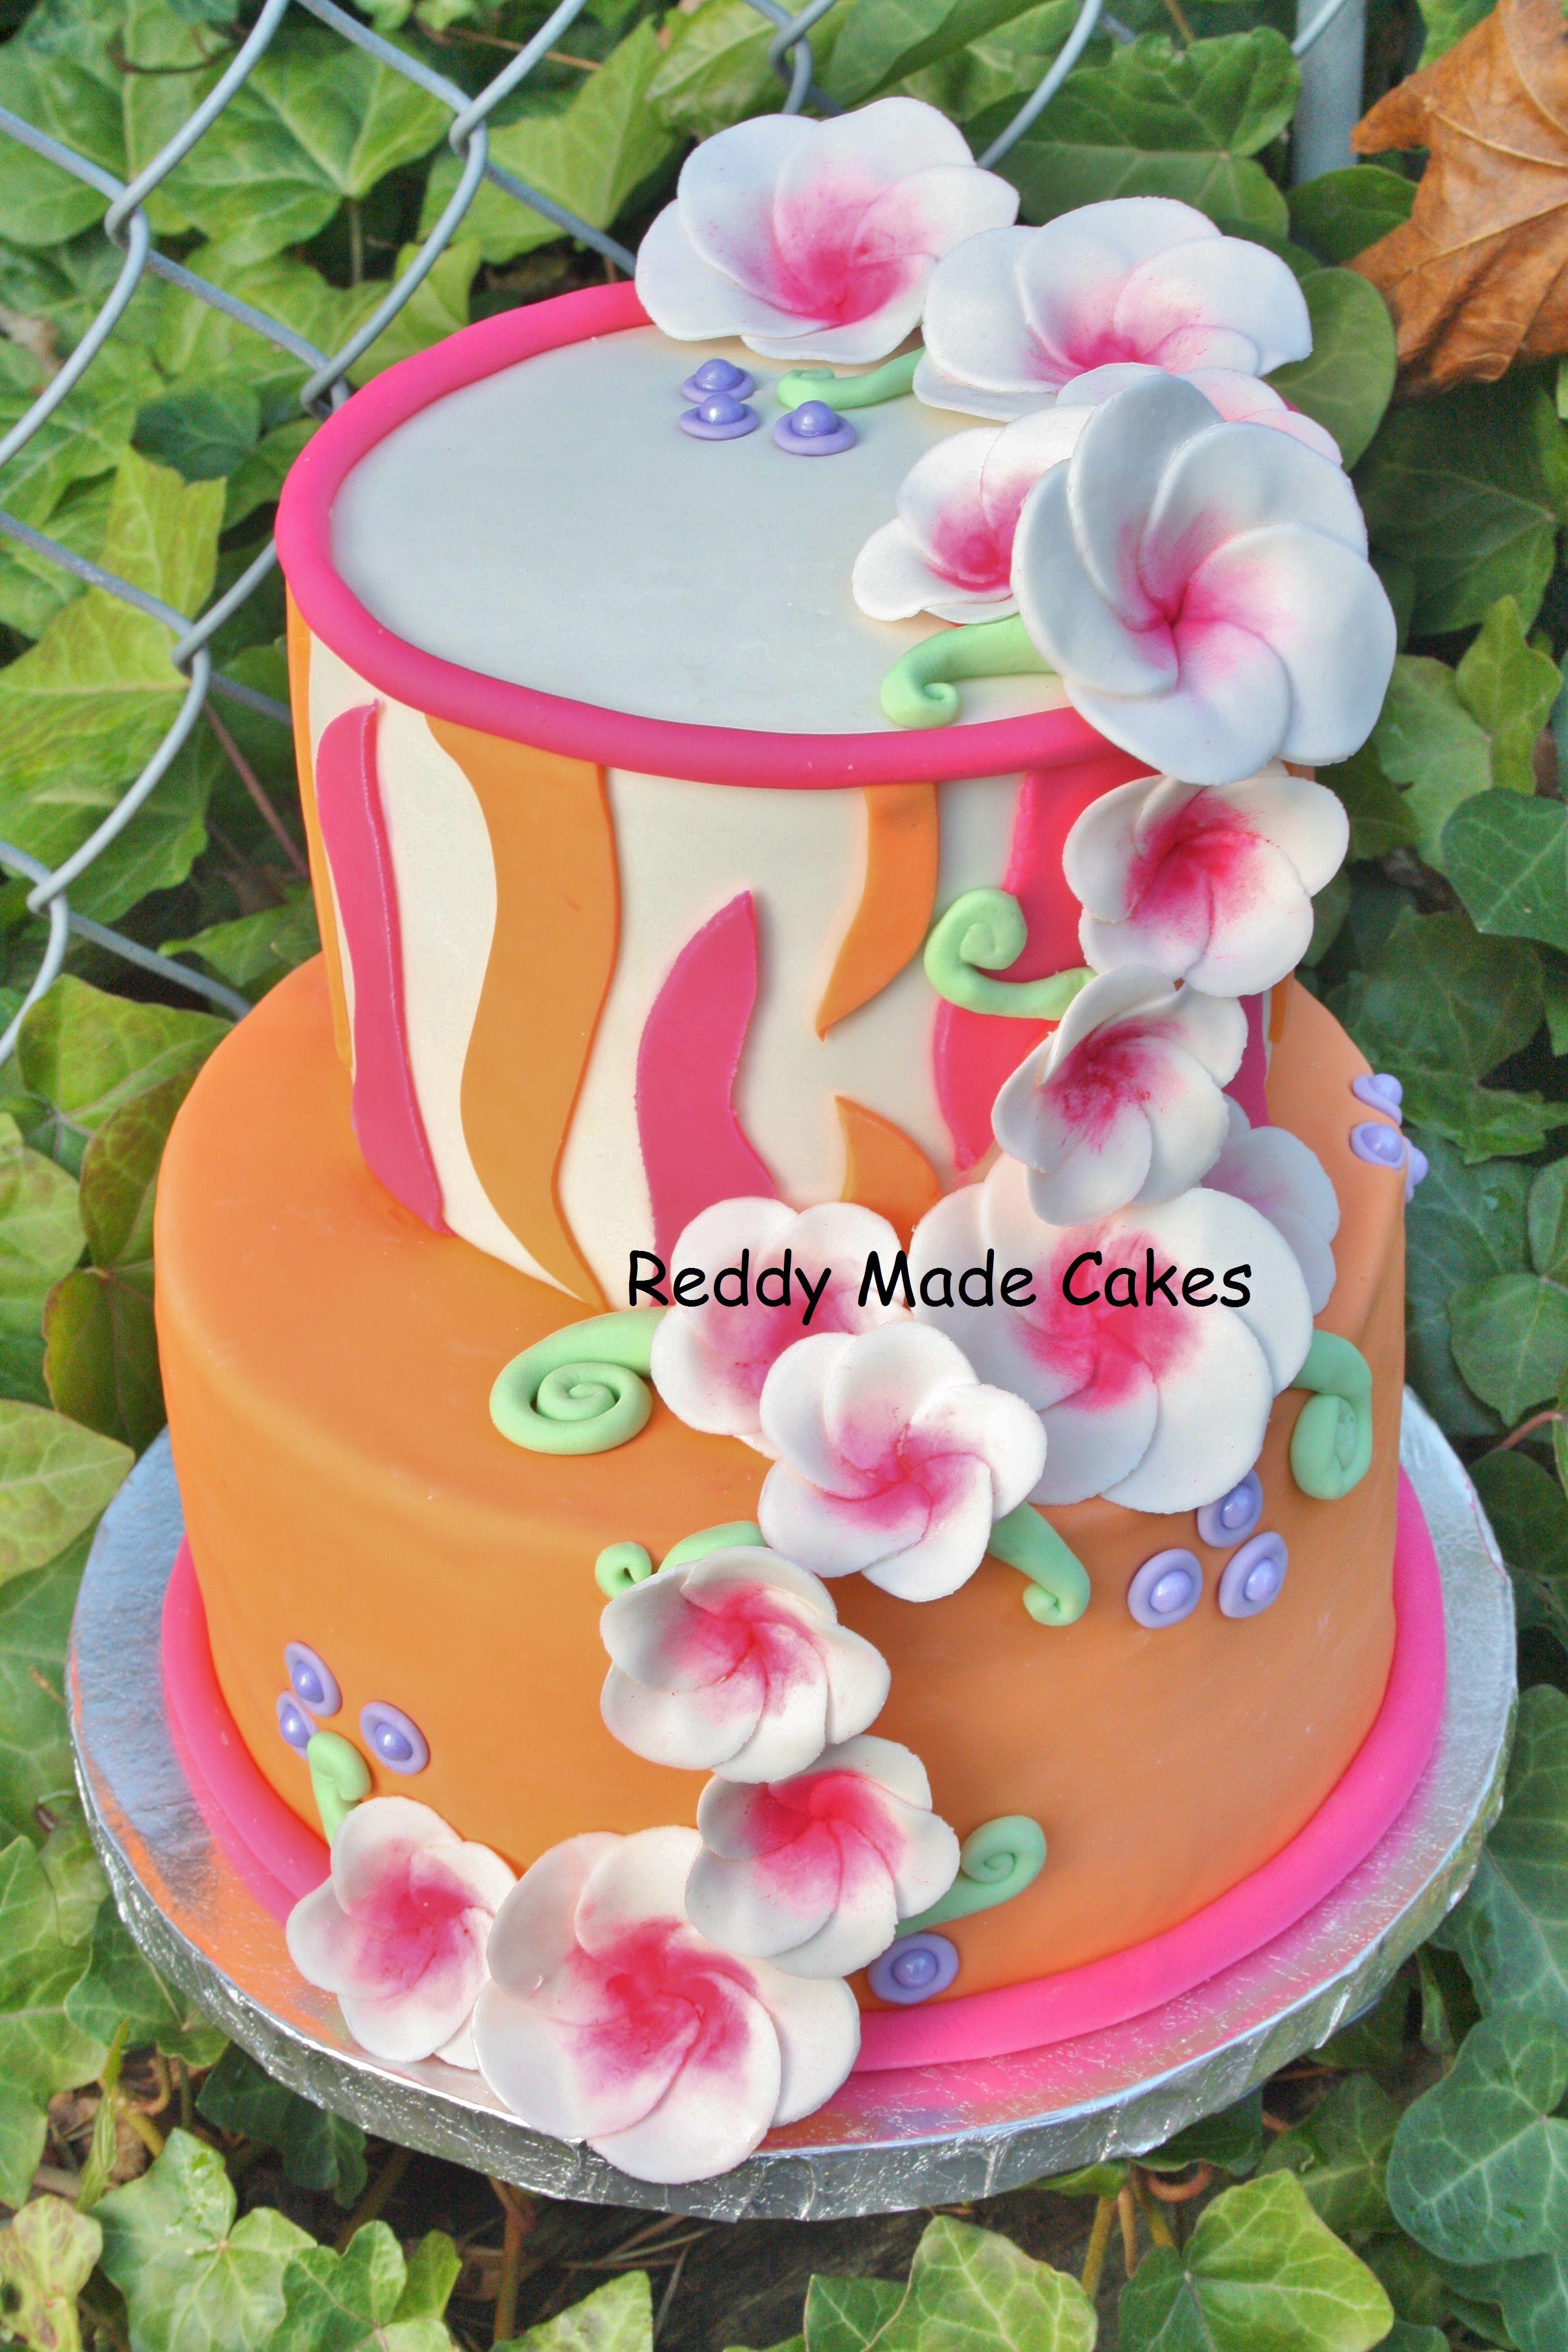 9th Birthday Cake Hannah Banana Pinterest Birthday cakes Cake